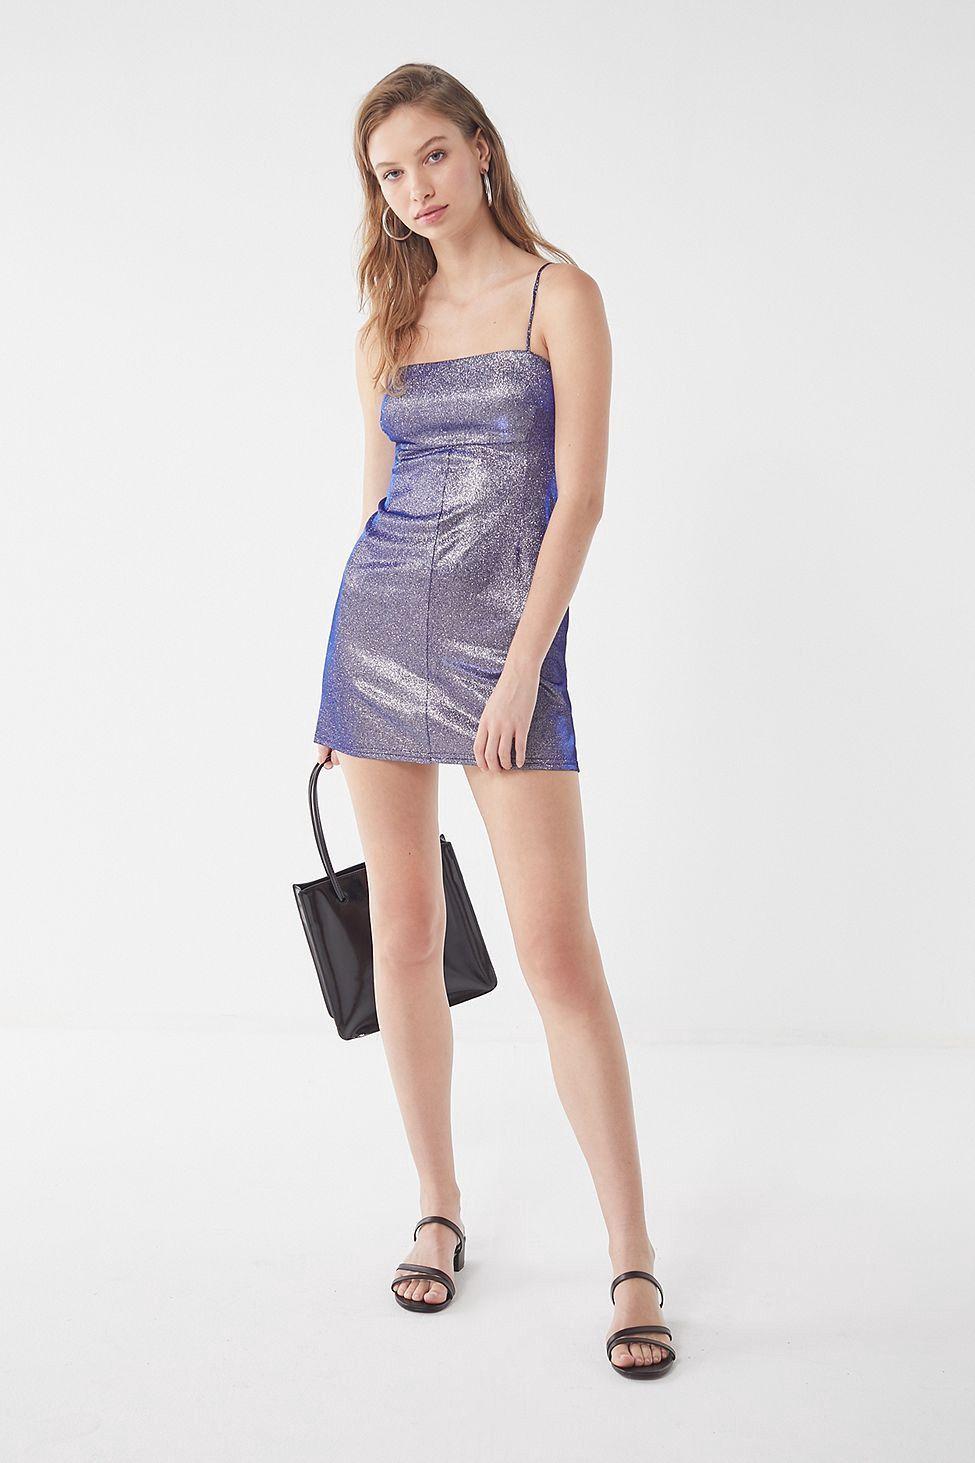 462bc9e36f4 Urban Outfitters Uo Sparkle Moon Beam Empire Waist Mini Dress - Purple Xl  Silver  UrbanWearFashionGrey